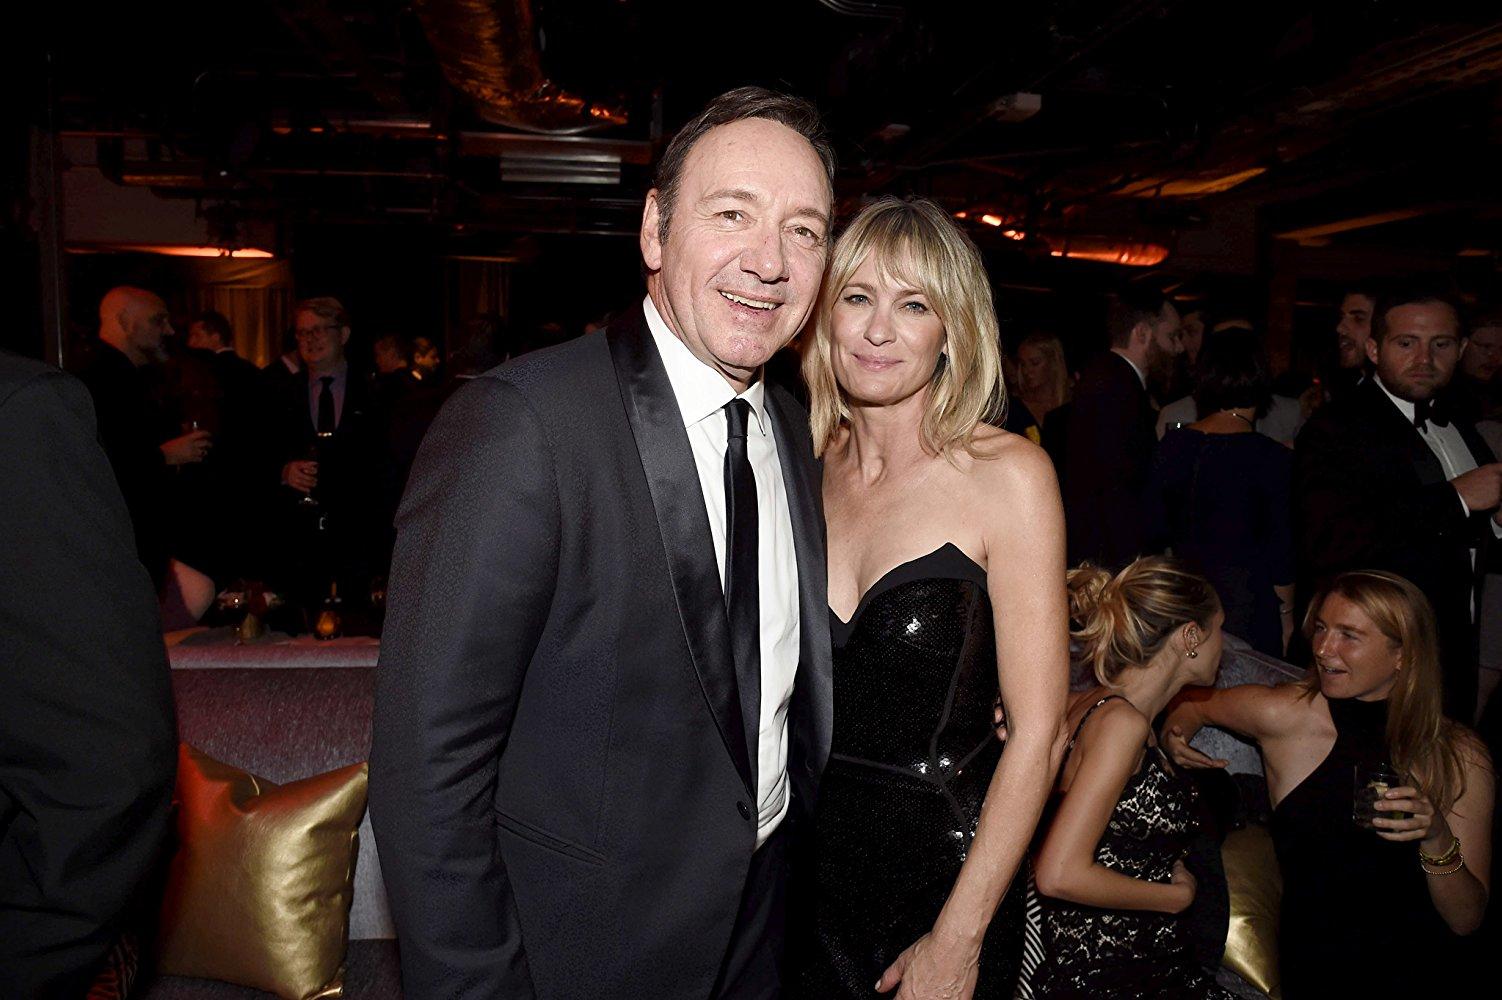 The 69th Primetime Emmy Awards